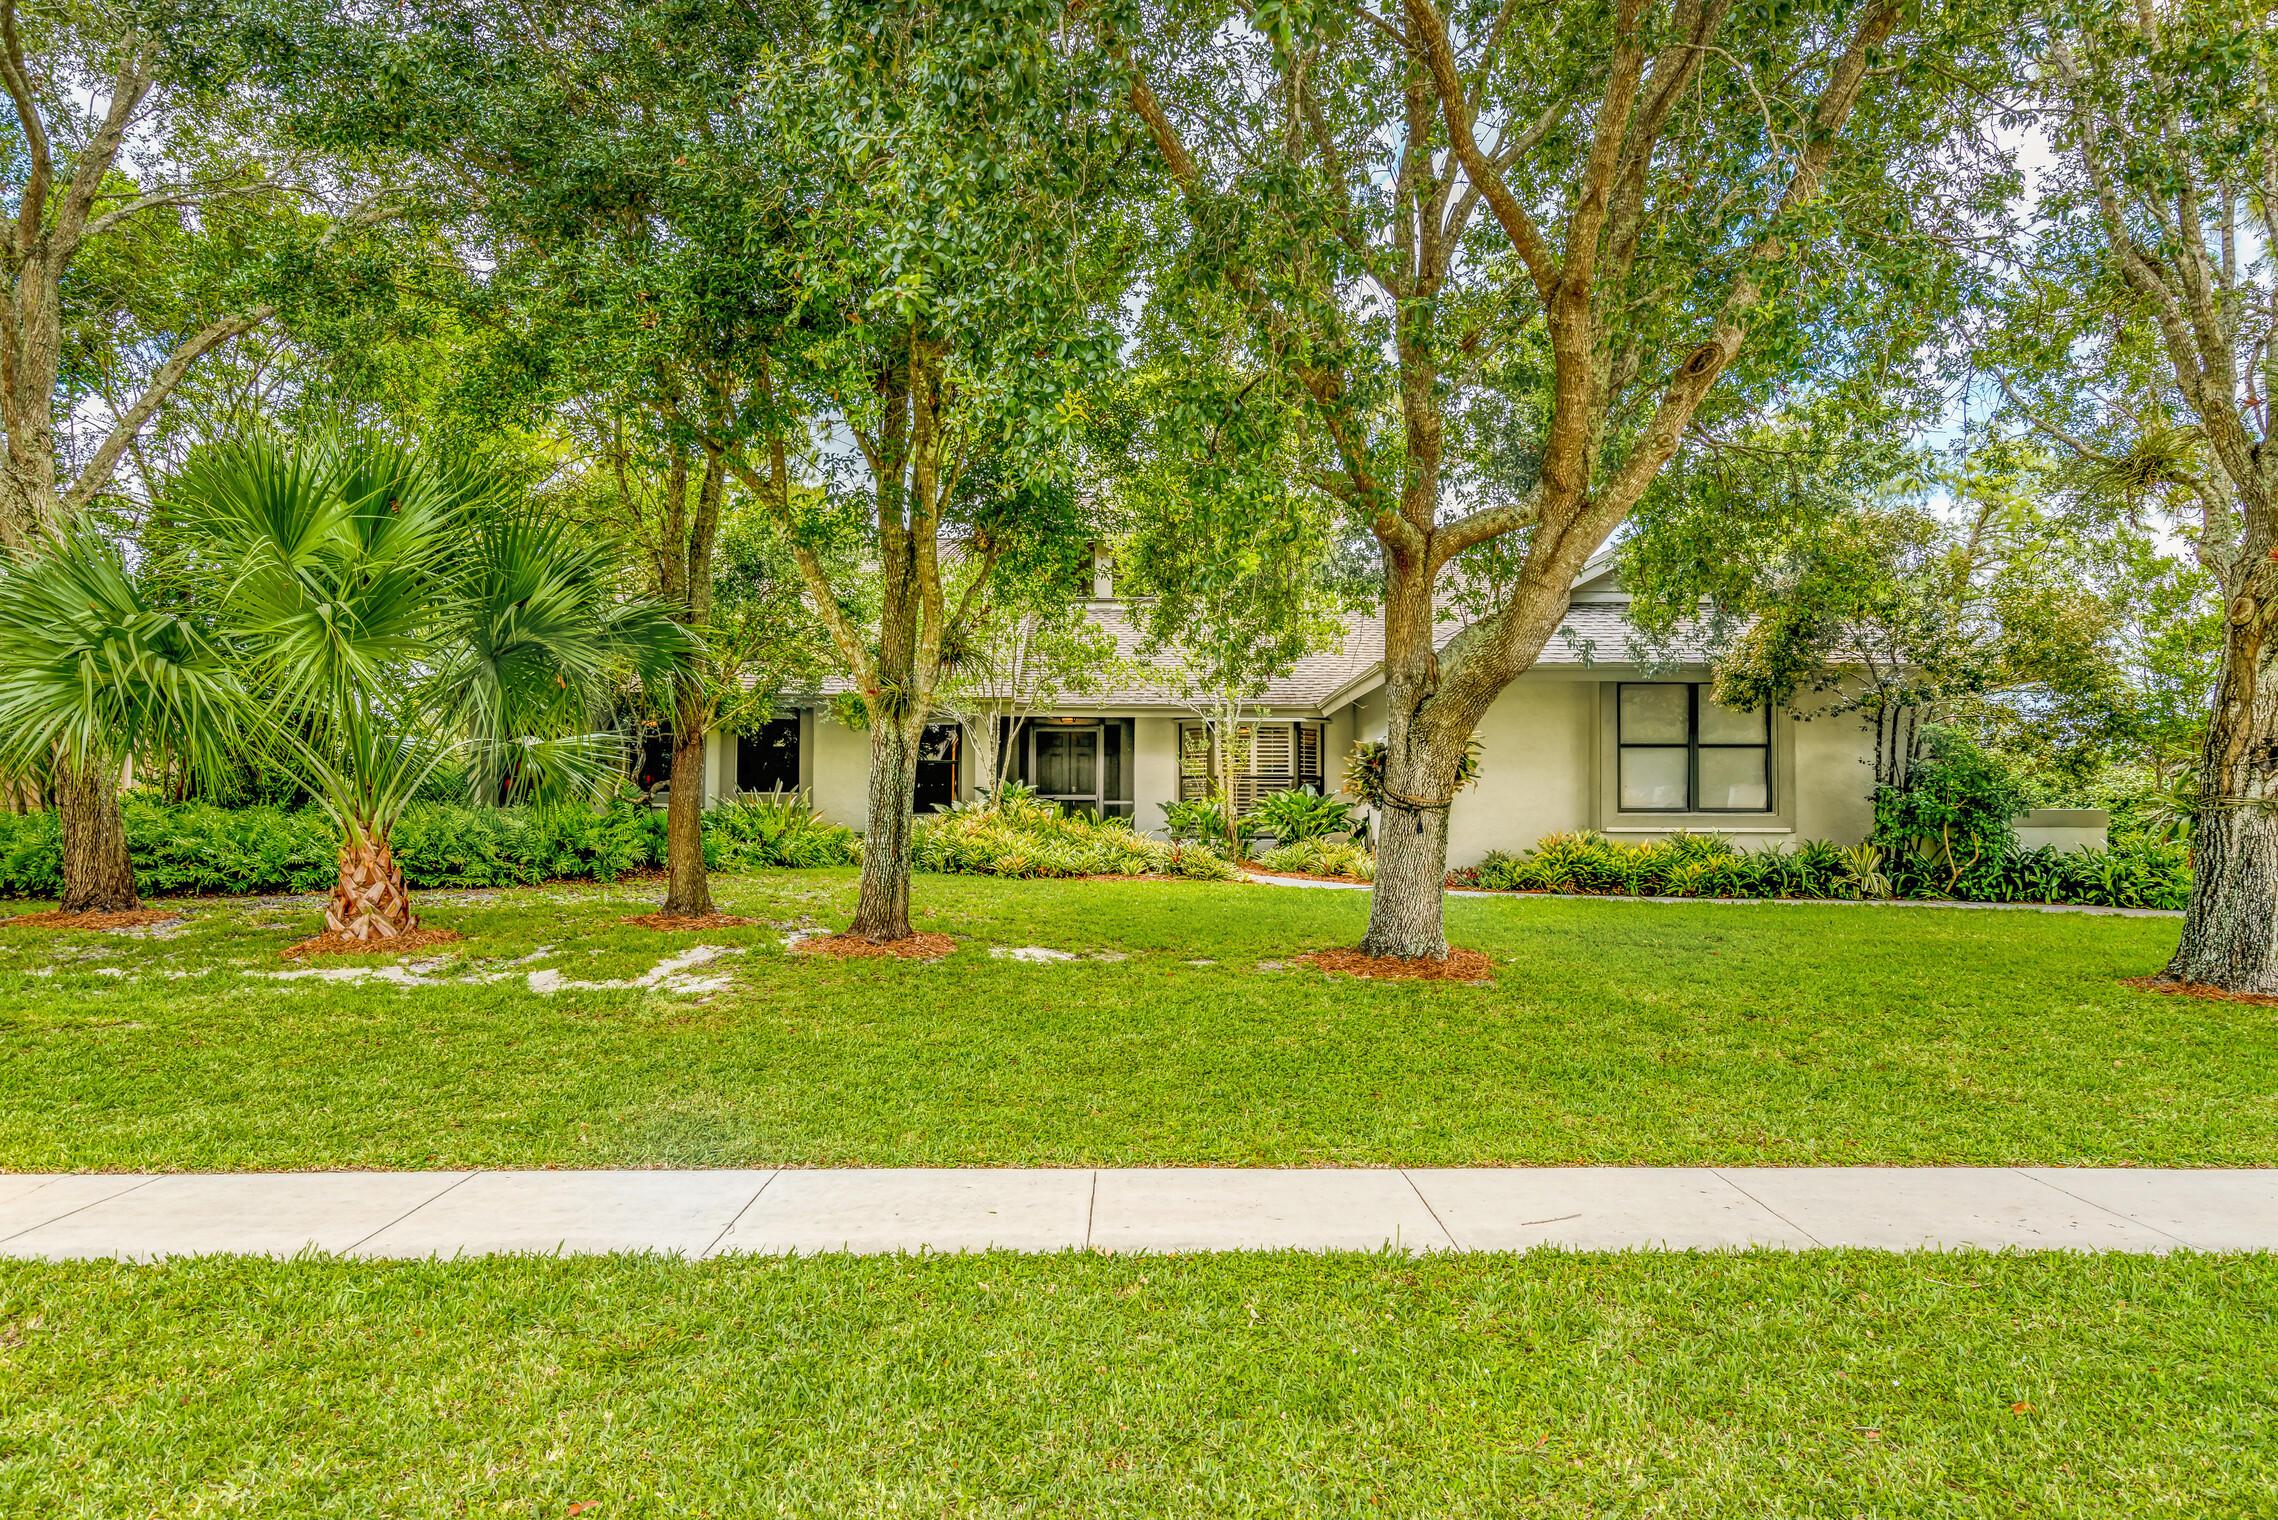 1435  Wood Dale Terrace  For Sale 10717515, FL